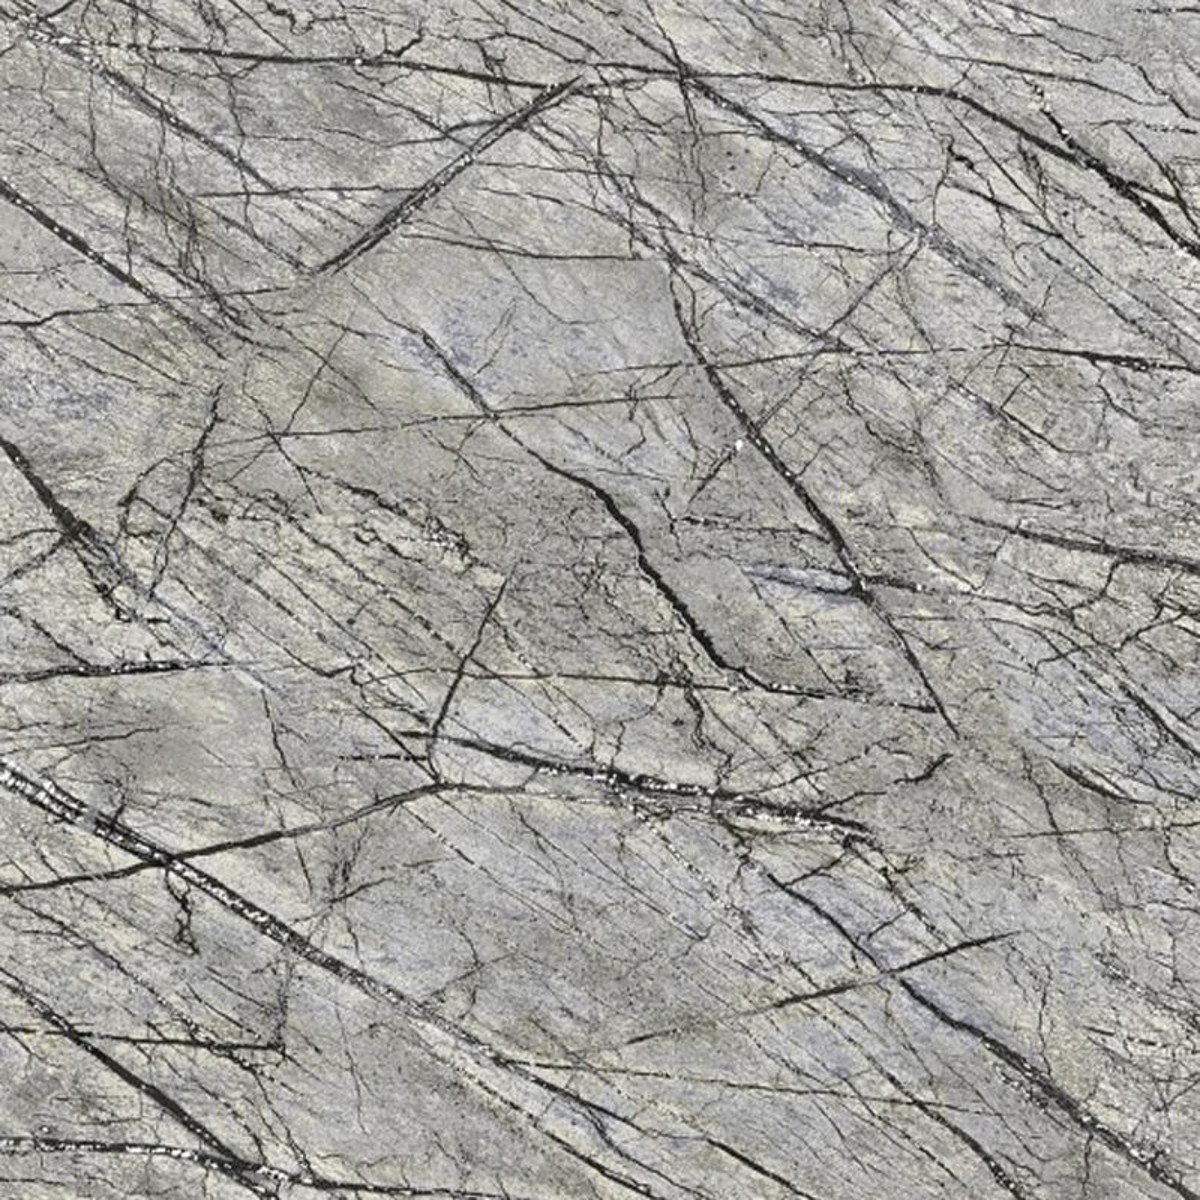 Обои флизелиновые Rasch African Queen II серые 0.53 м 474015